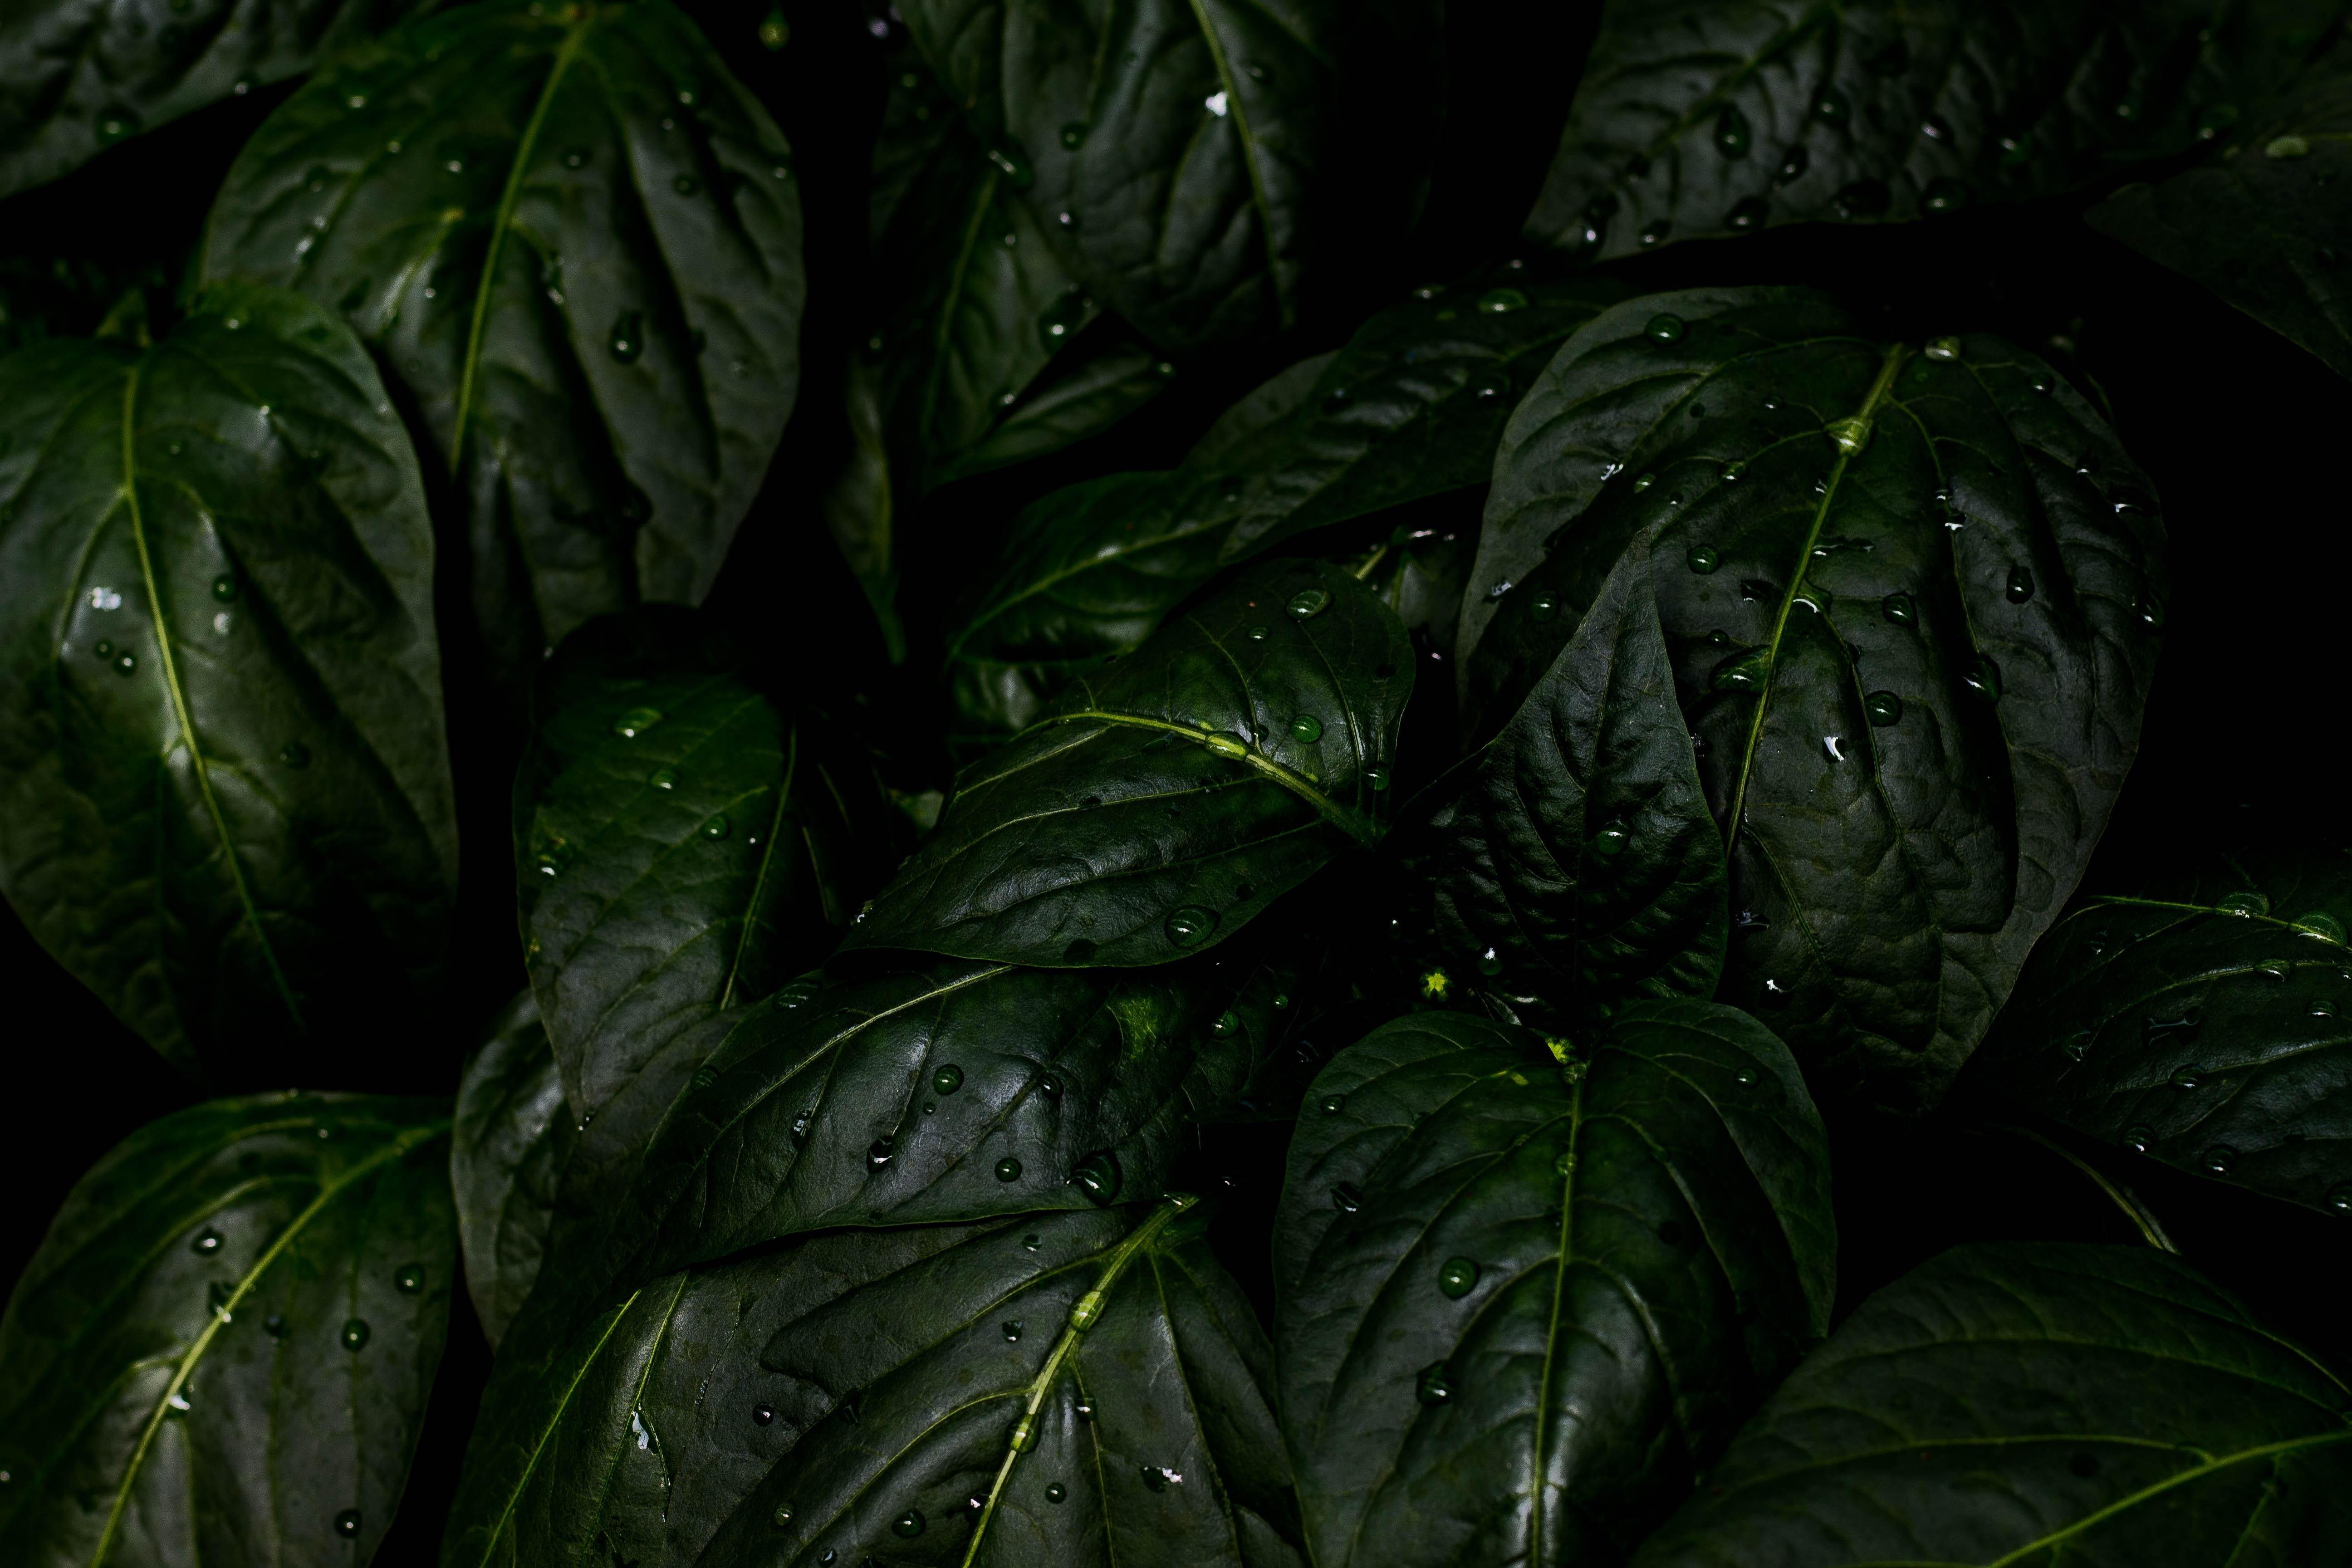 Rain Wallpapers, Photos And Desktop Backgrounds Up To 8K